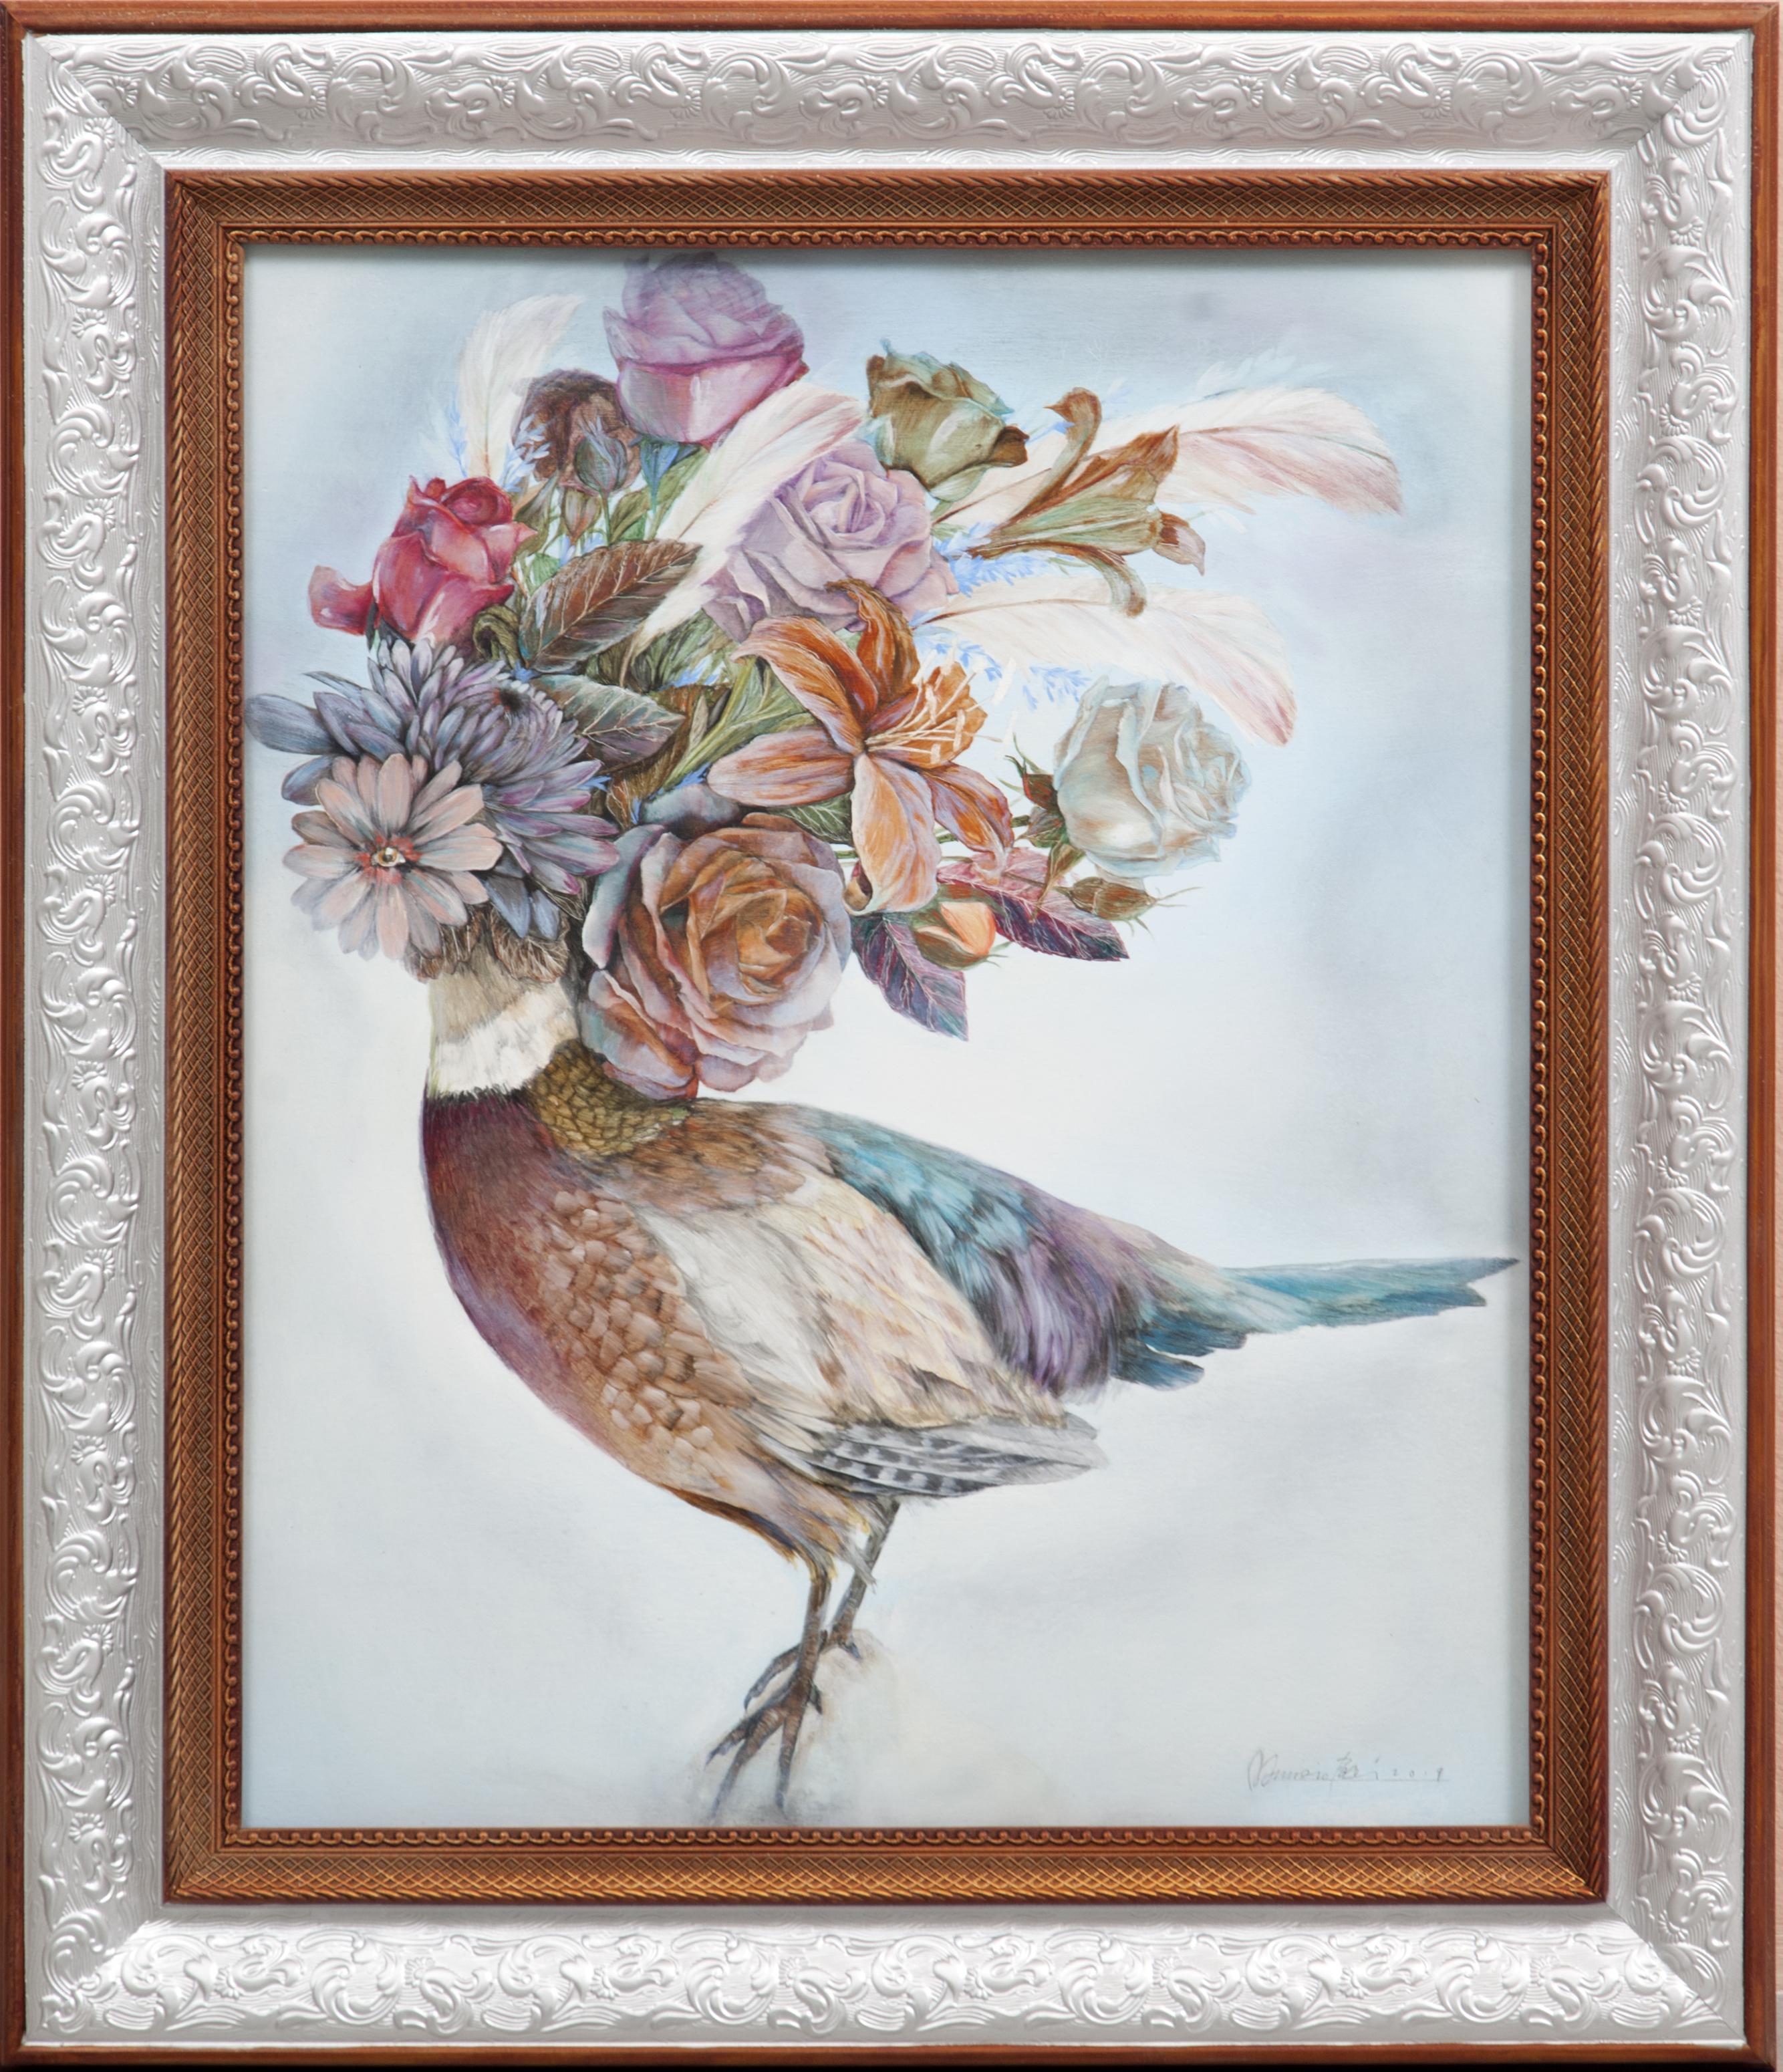 Deformed Pheasant